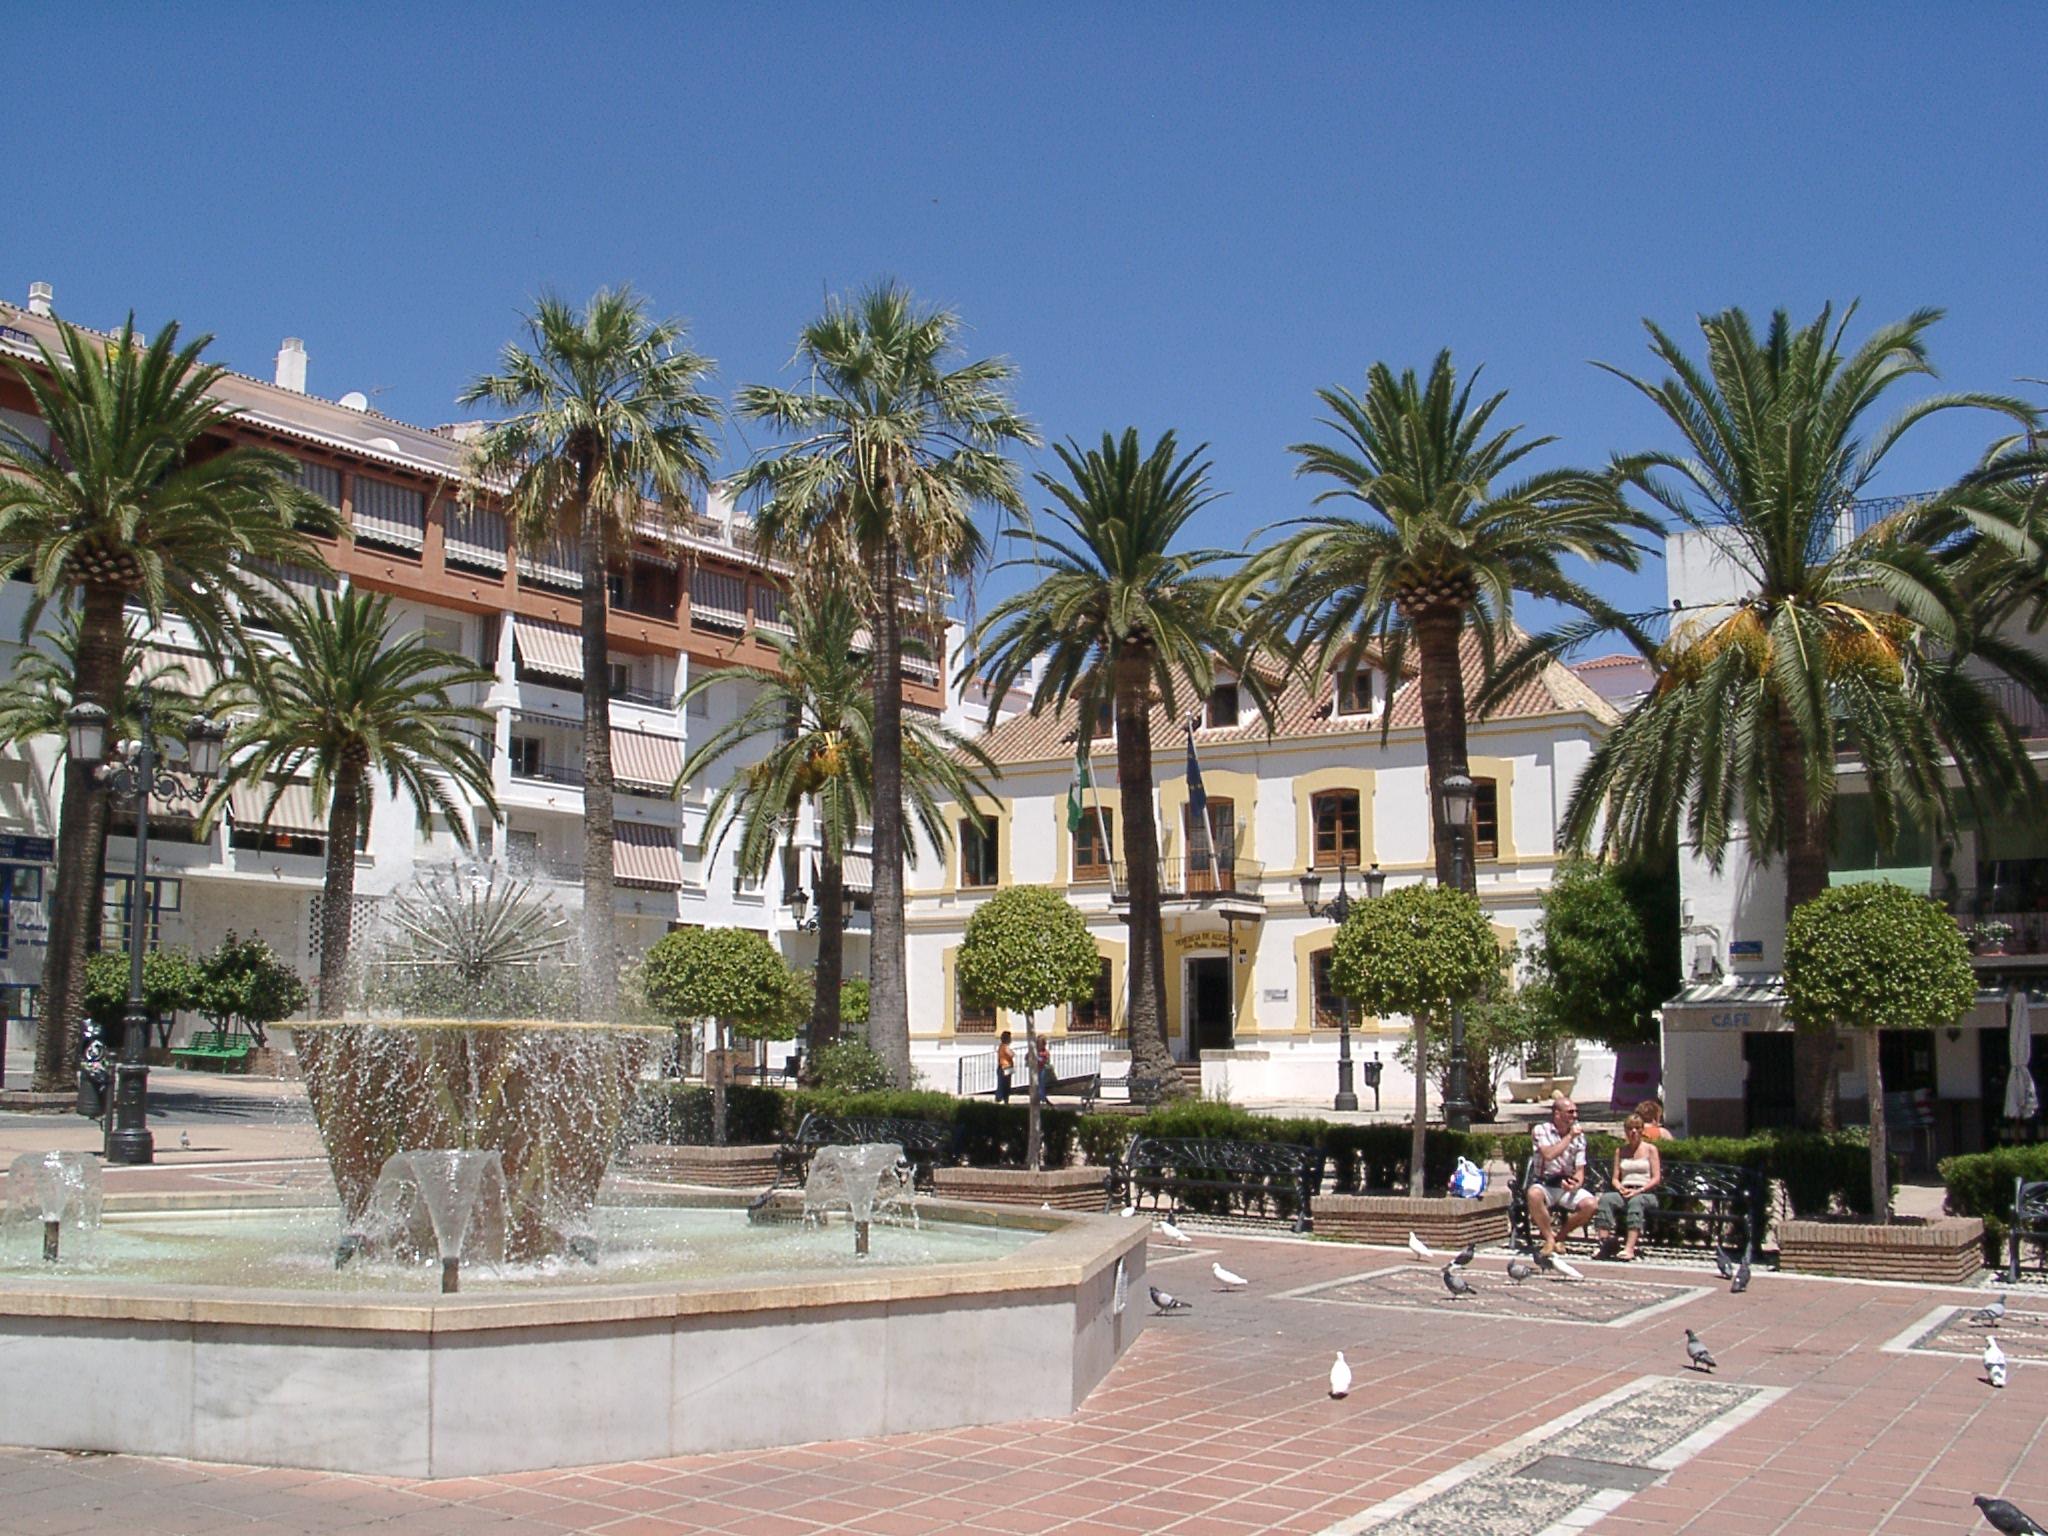 San Pedro de Alcantara Spain  city images : San pedro alcantara platz Wikimedia Commons